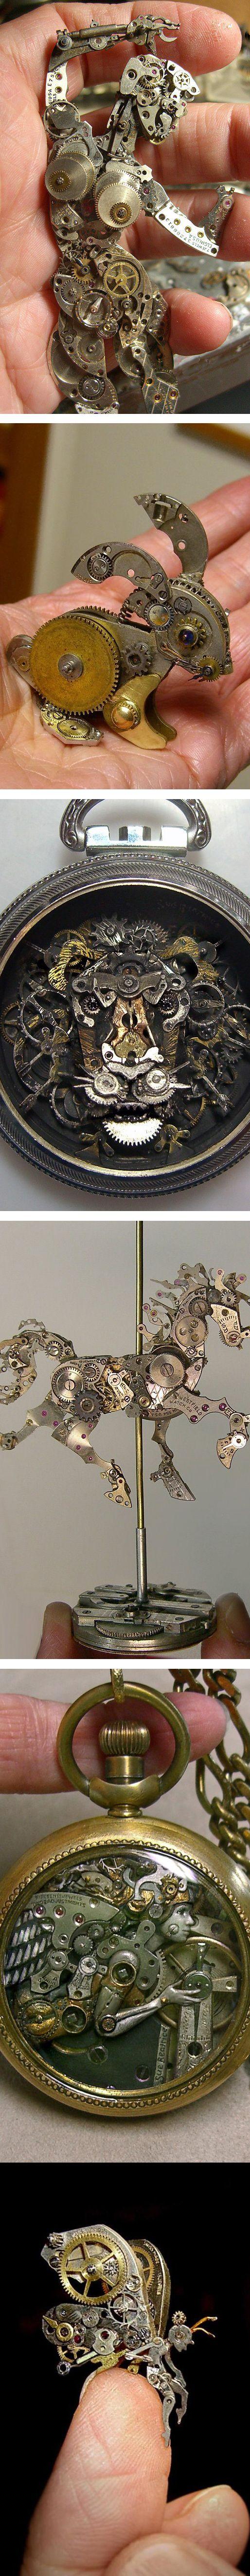 Watch Part Sculptures by Sue Beatrice